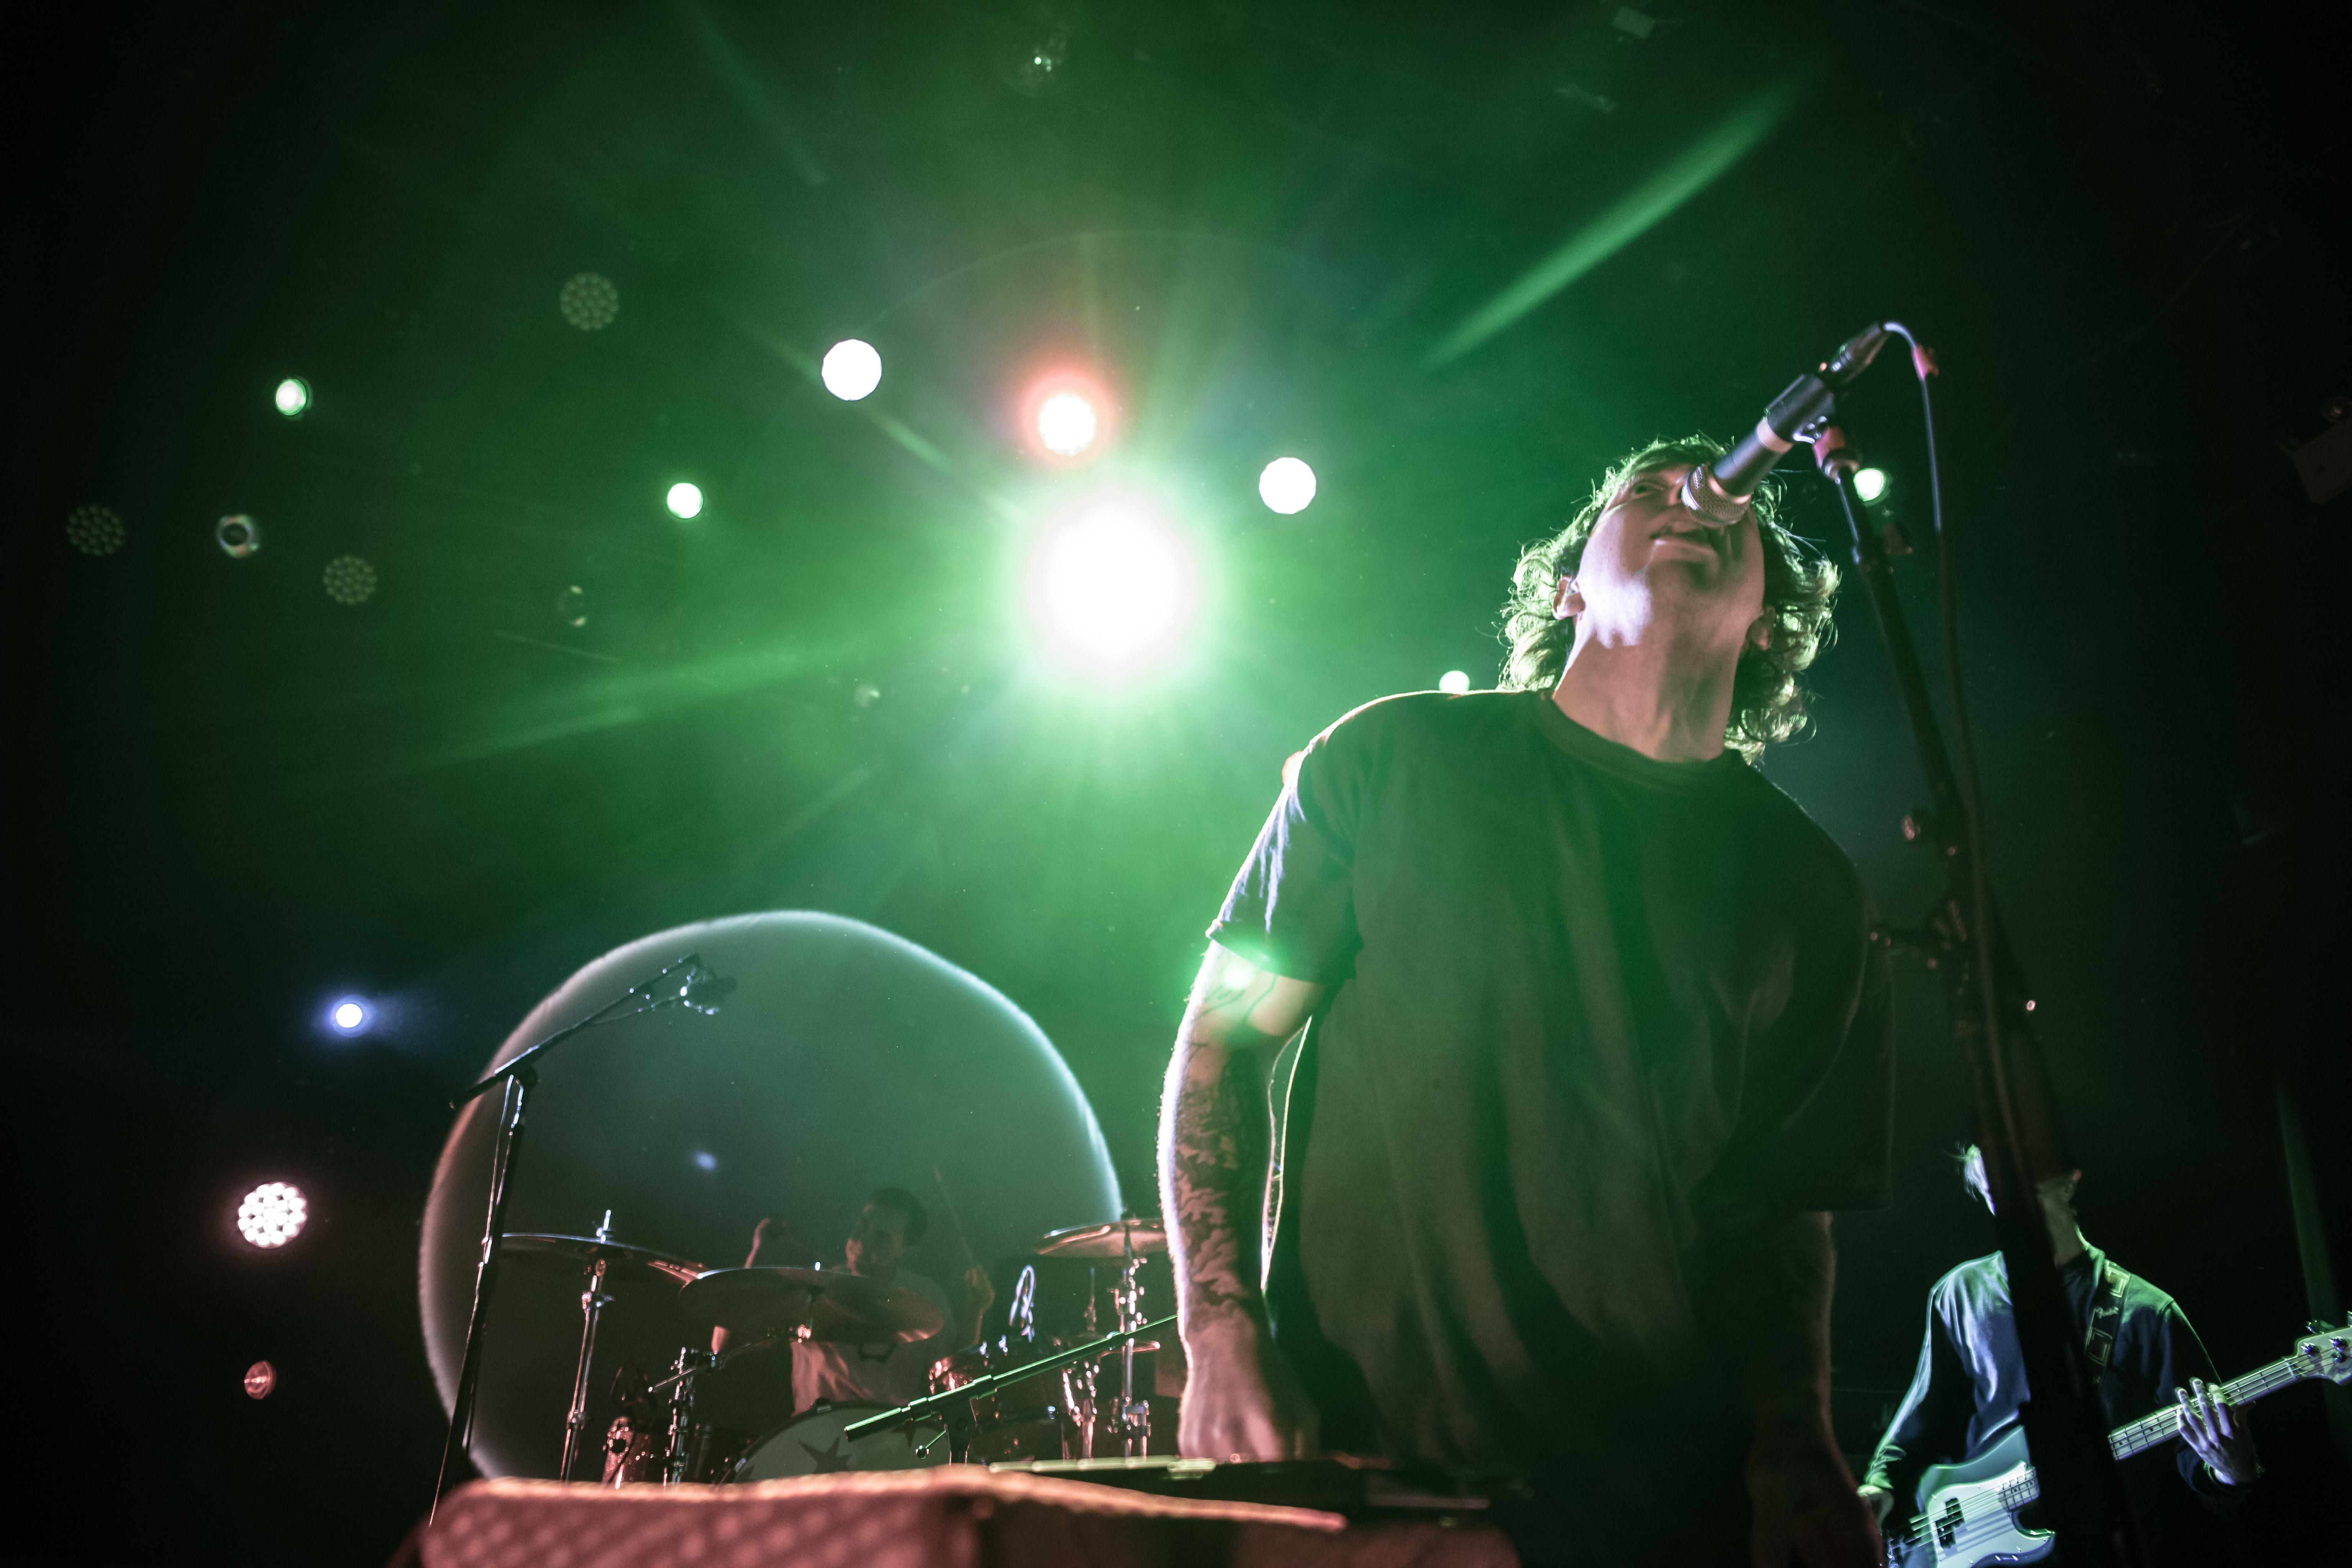 PHOTOS: 'As You Please' Tour at Irving Plaza